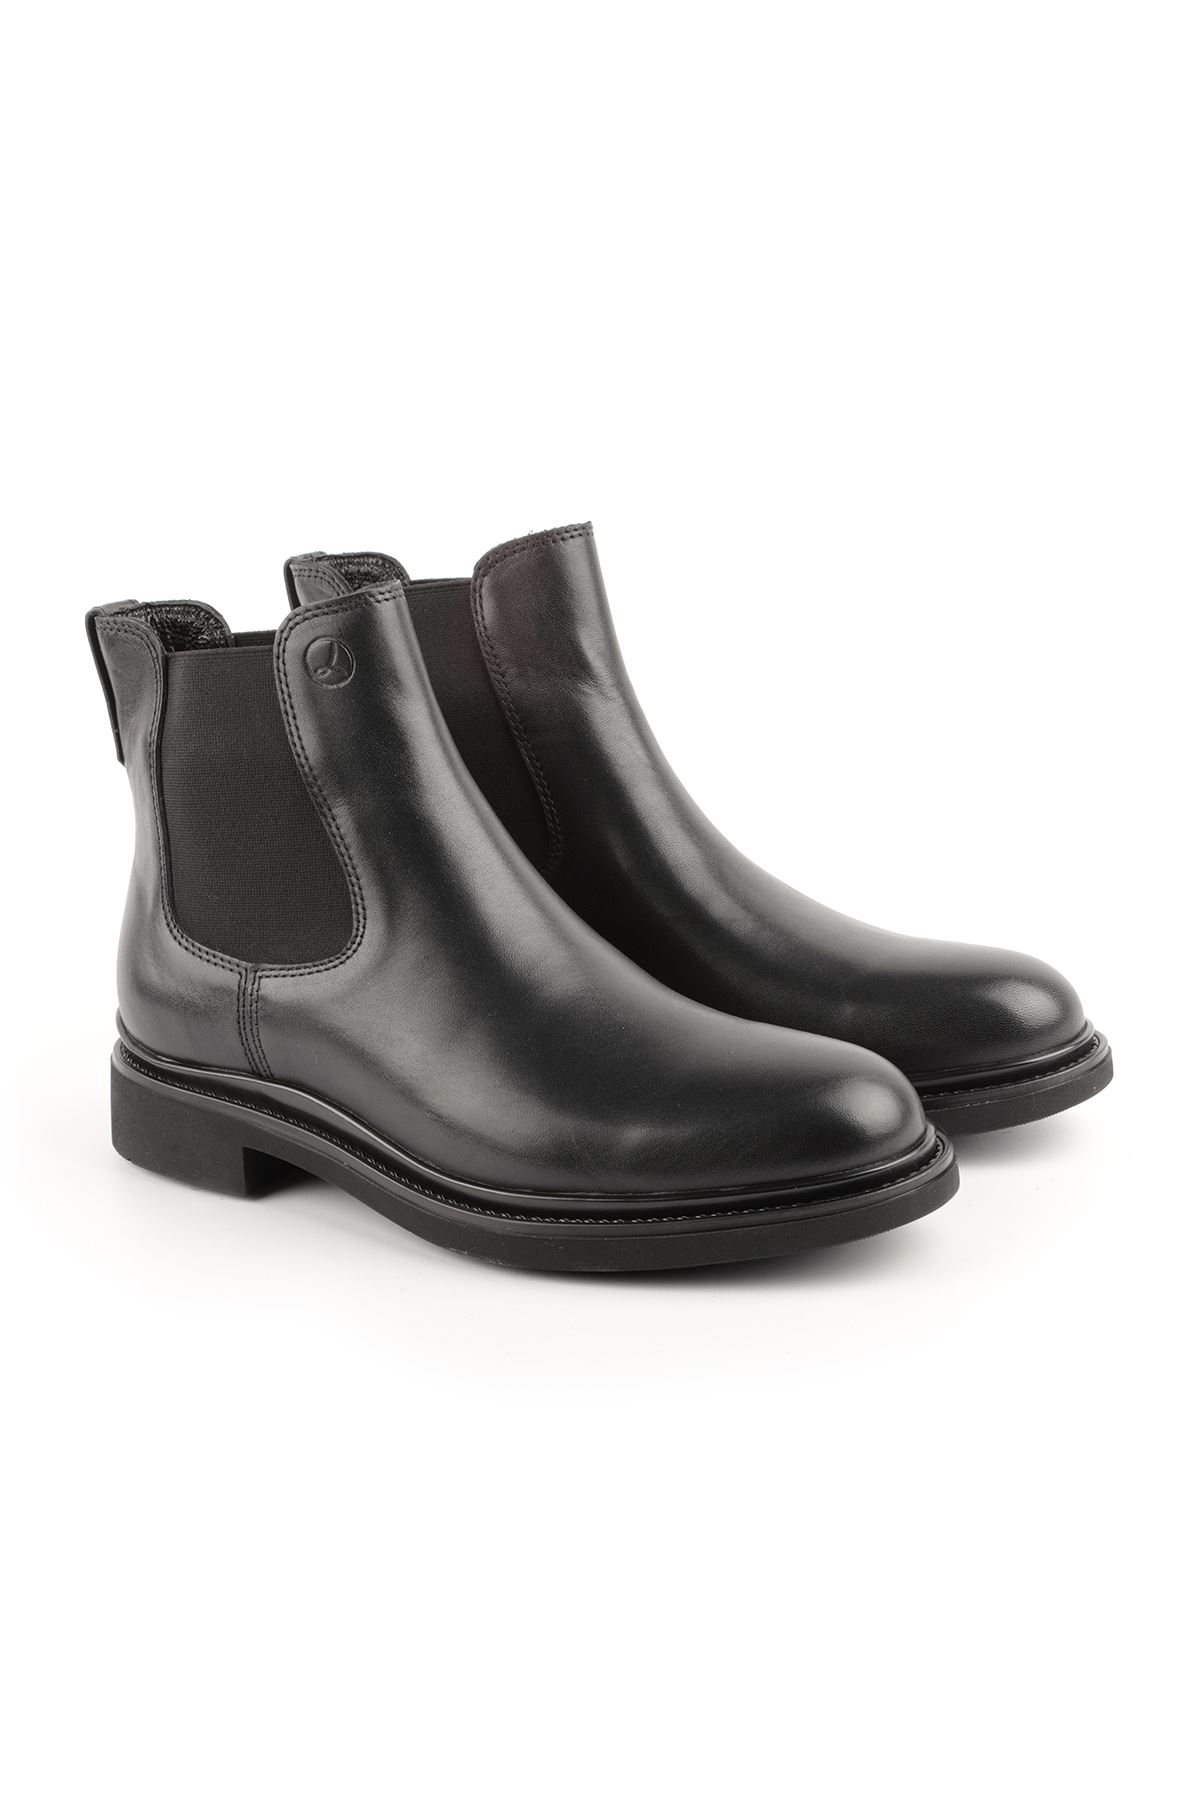 Libero L3454 Black Leather Boot